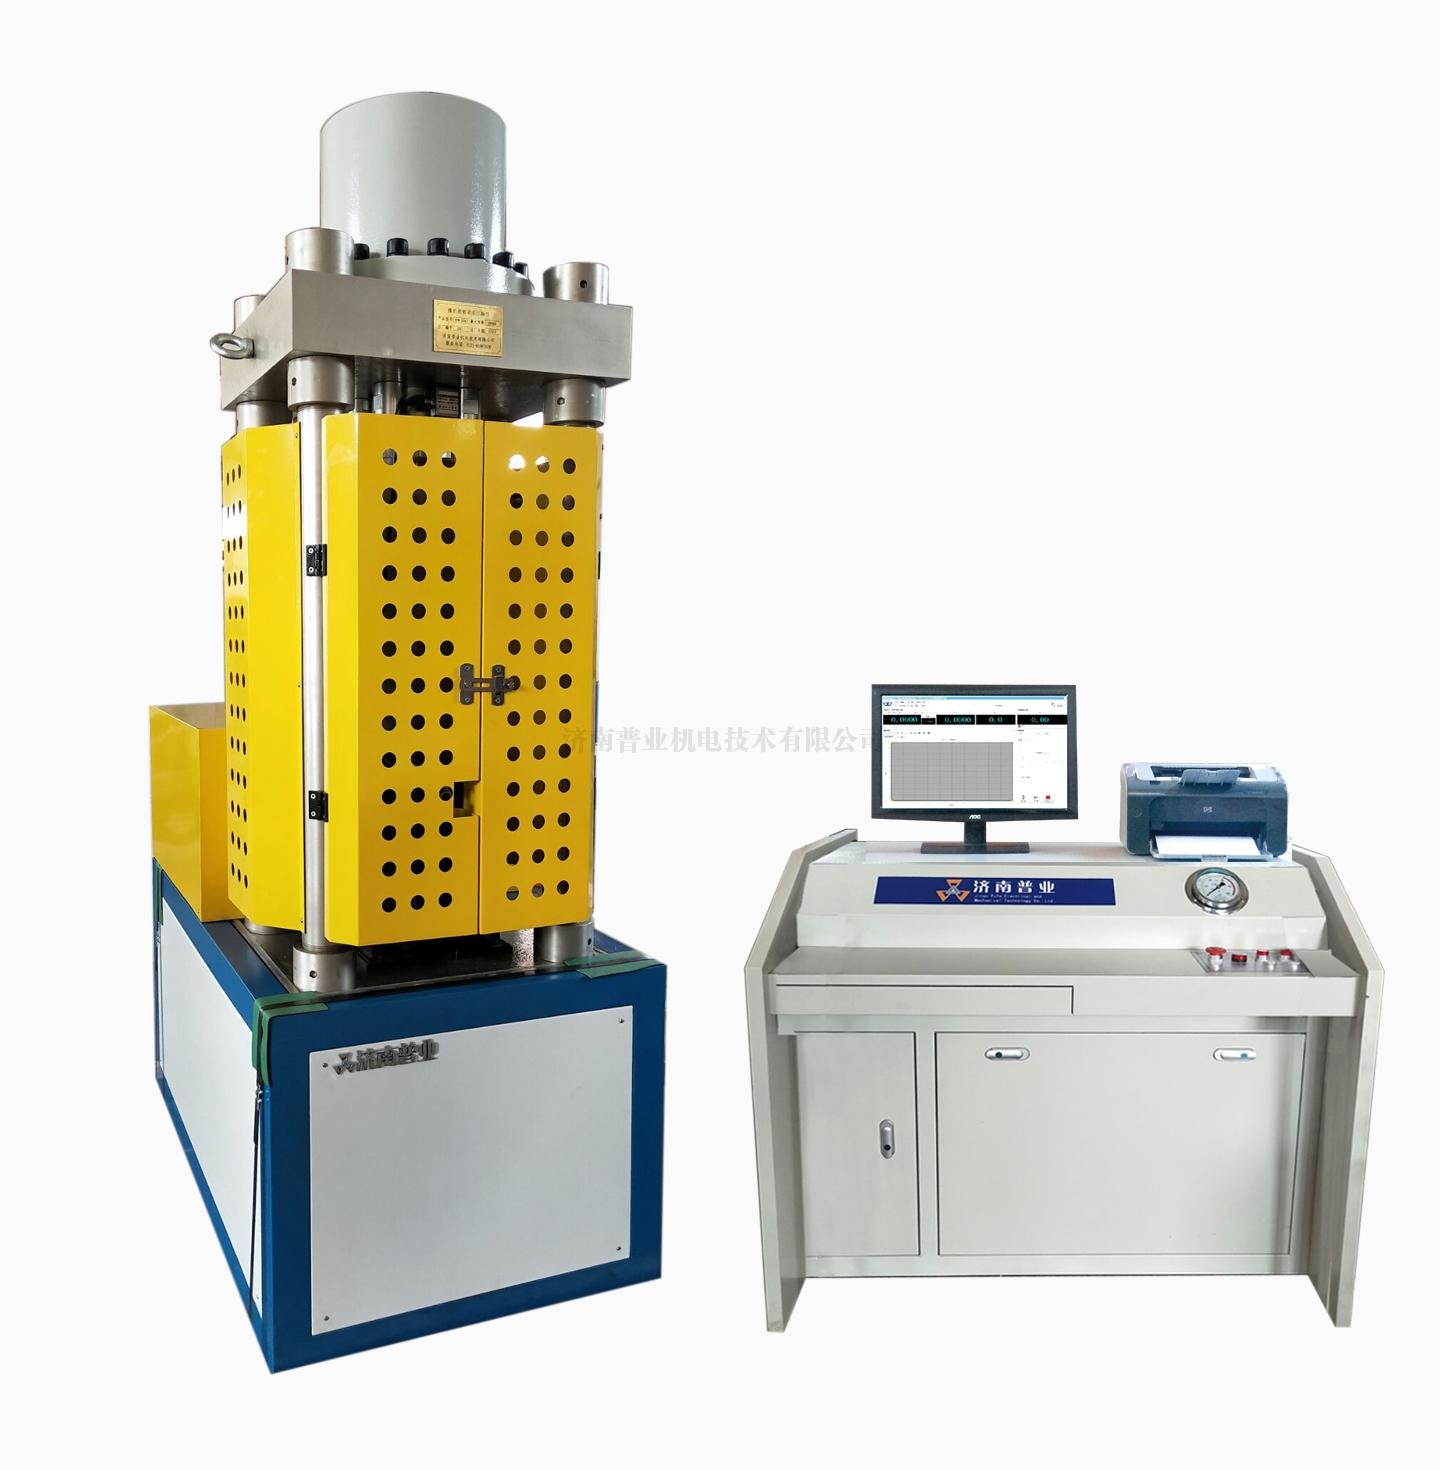 HYW-500微机控制岩石三轴仪